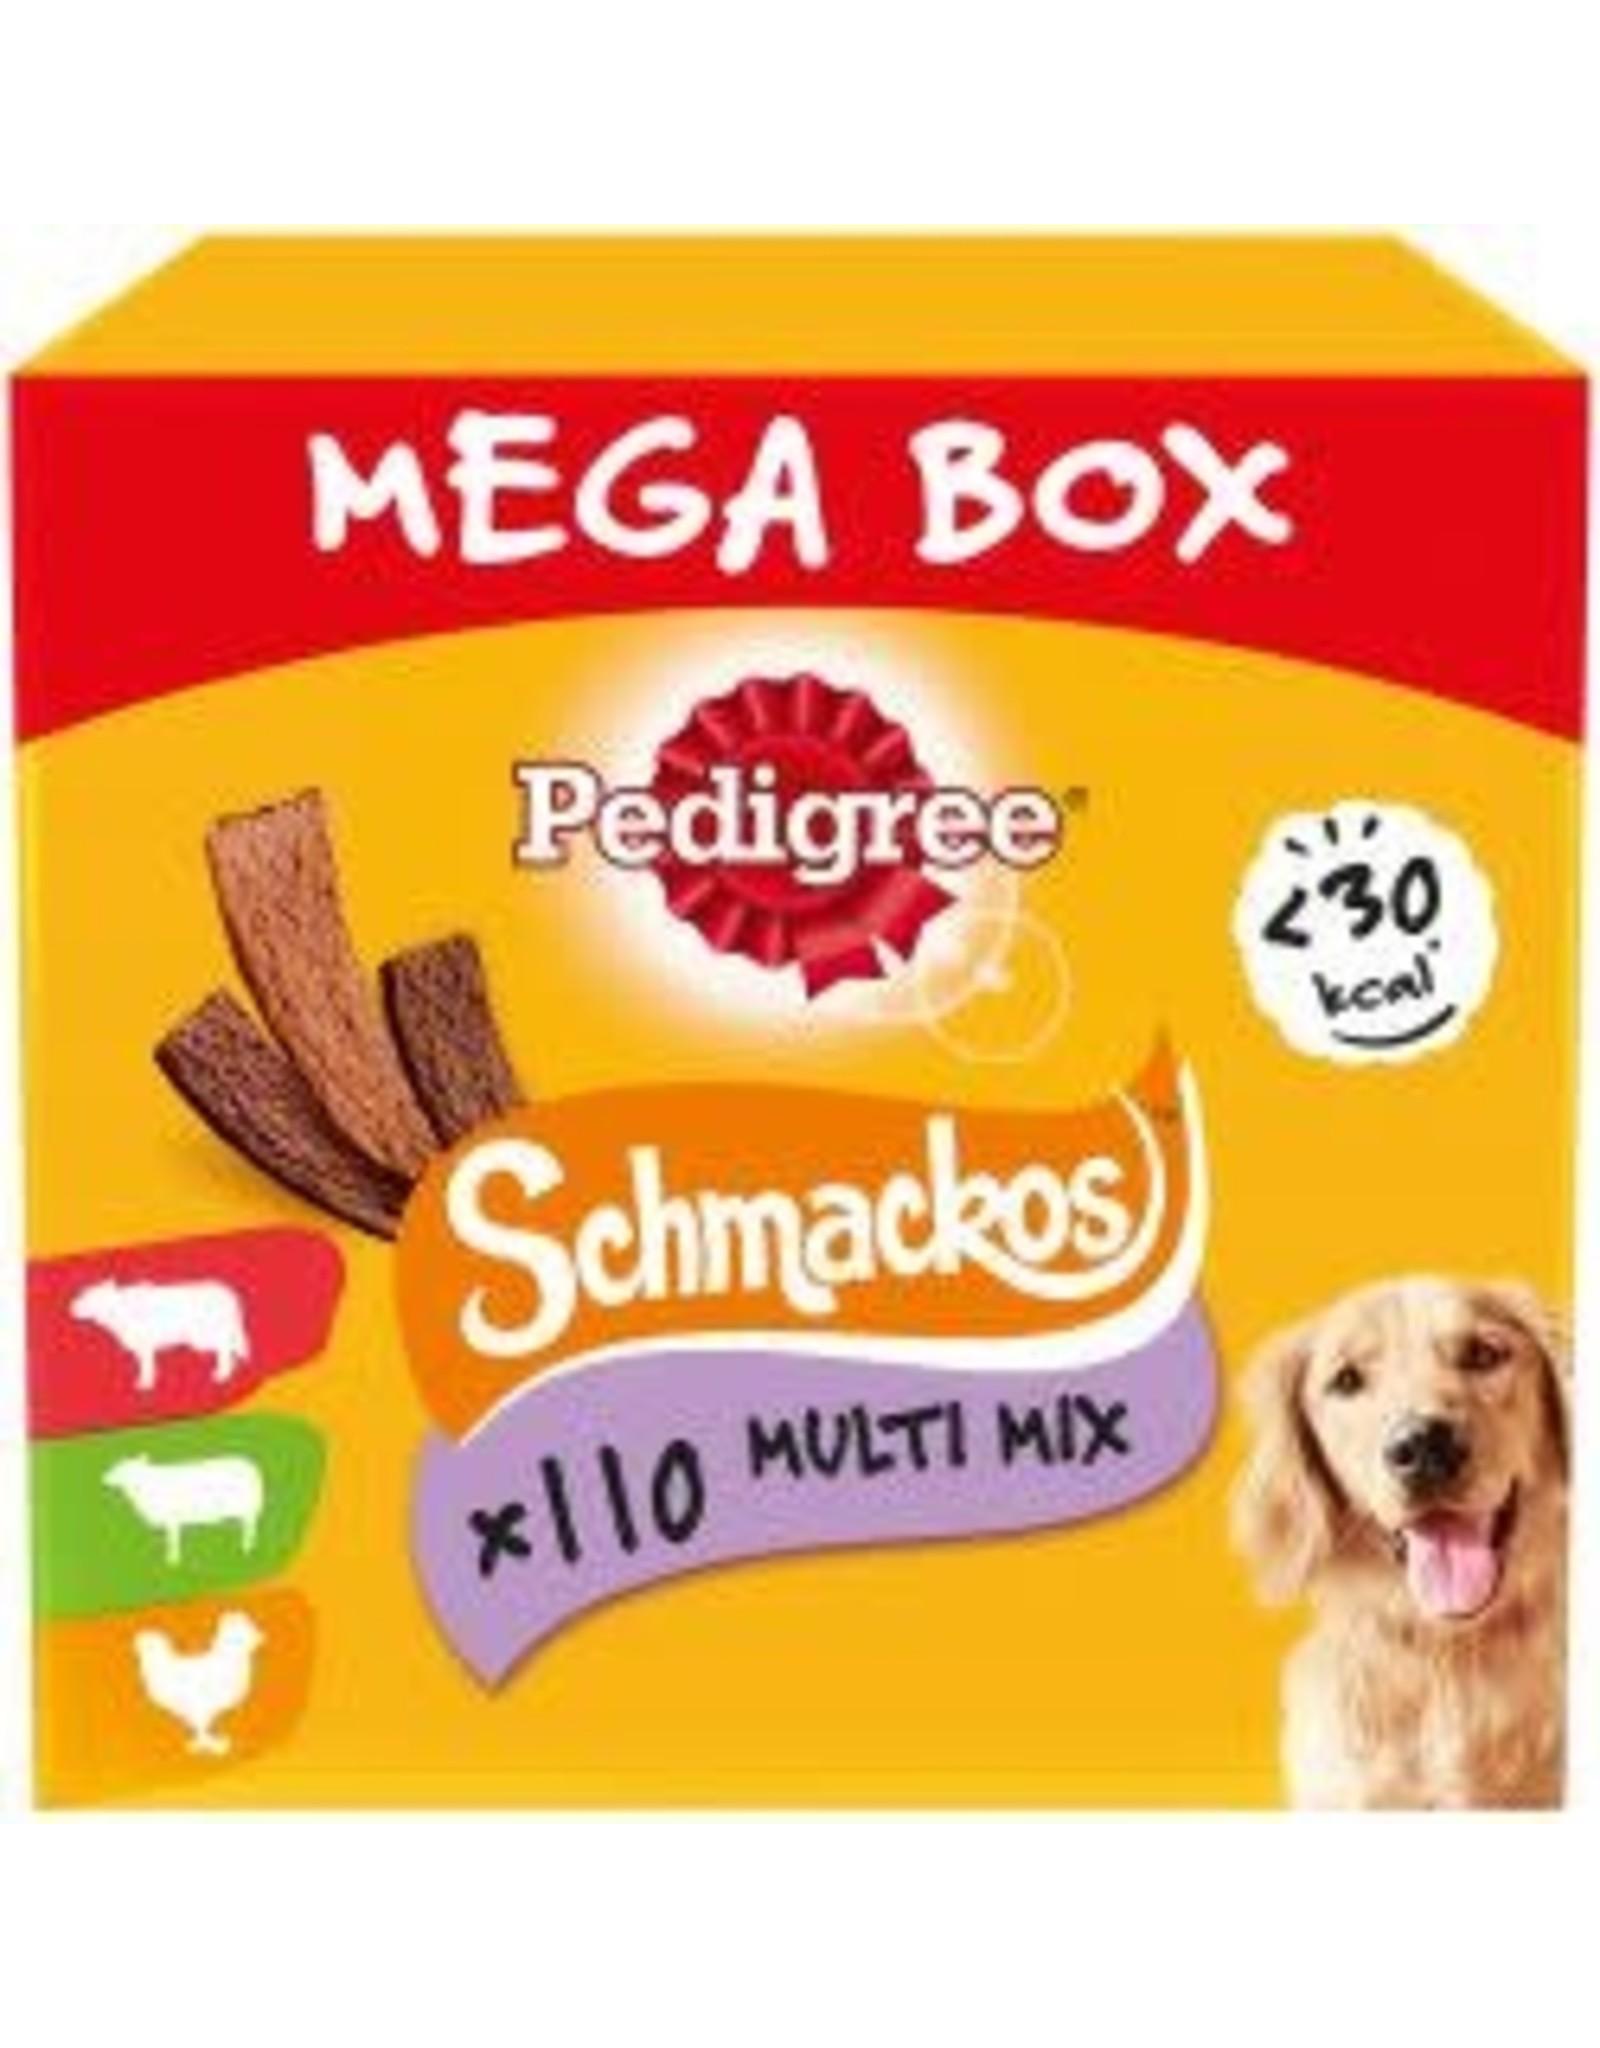 Pedigree Pedigree Schmackos Variety 110 Stick Mega Box